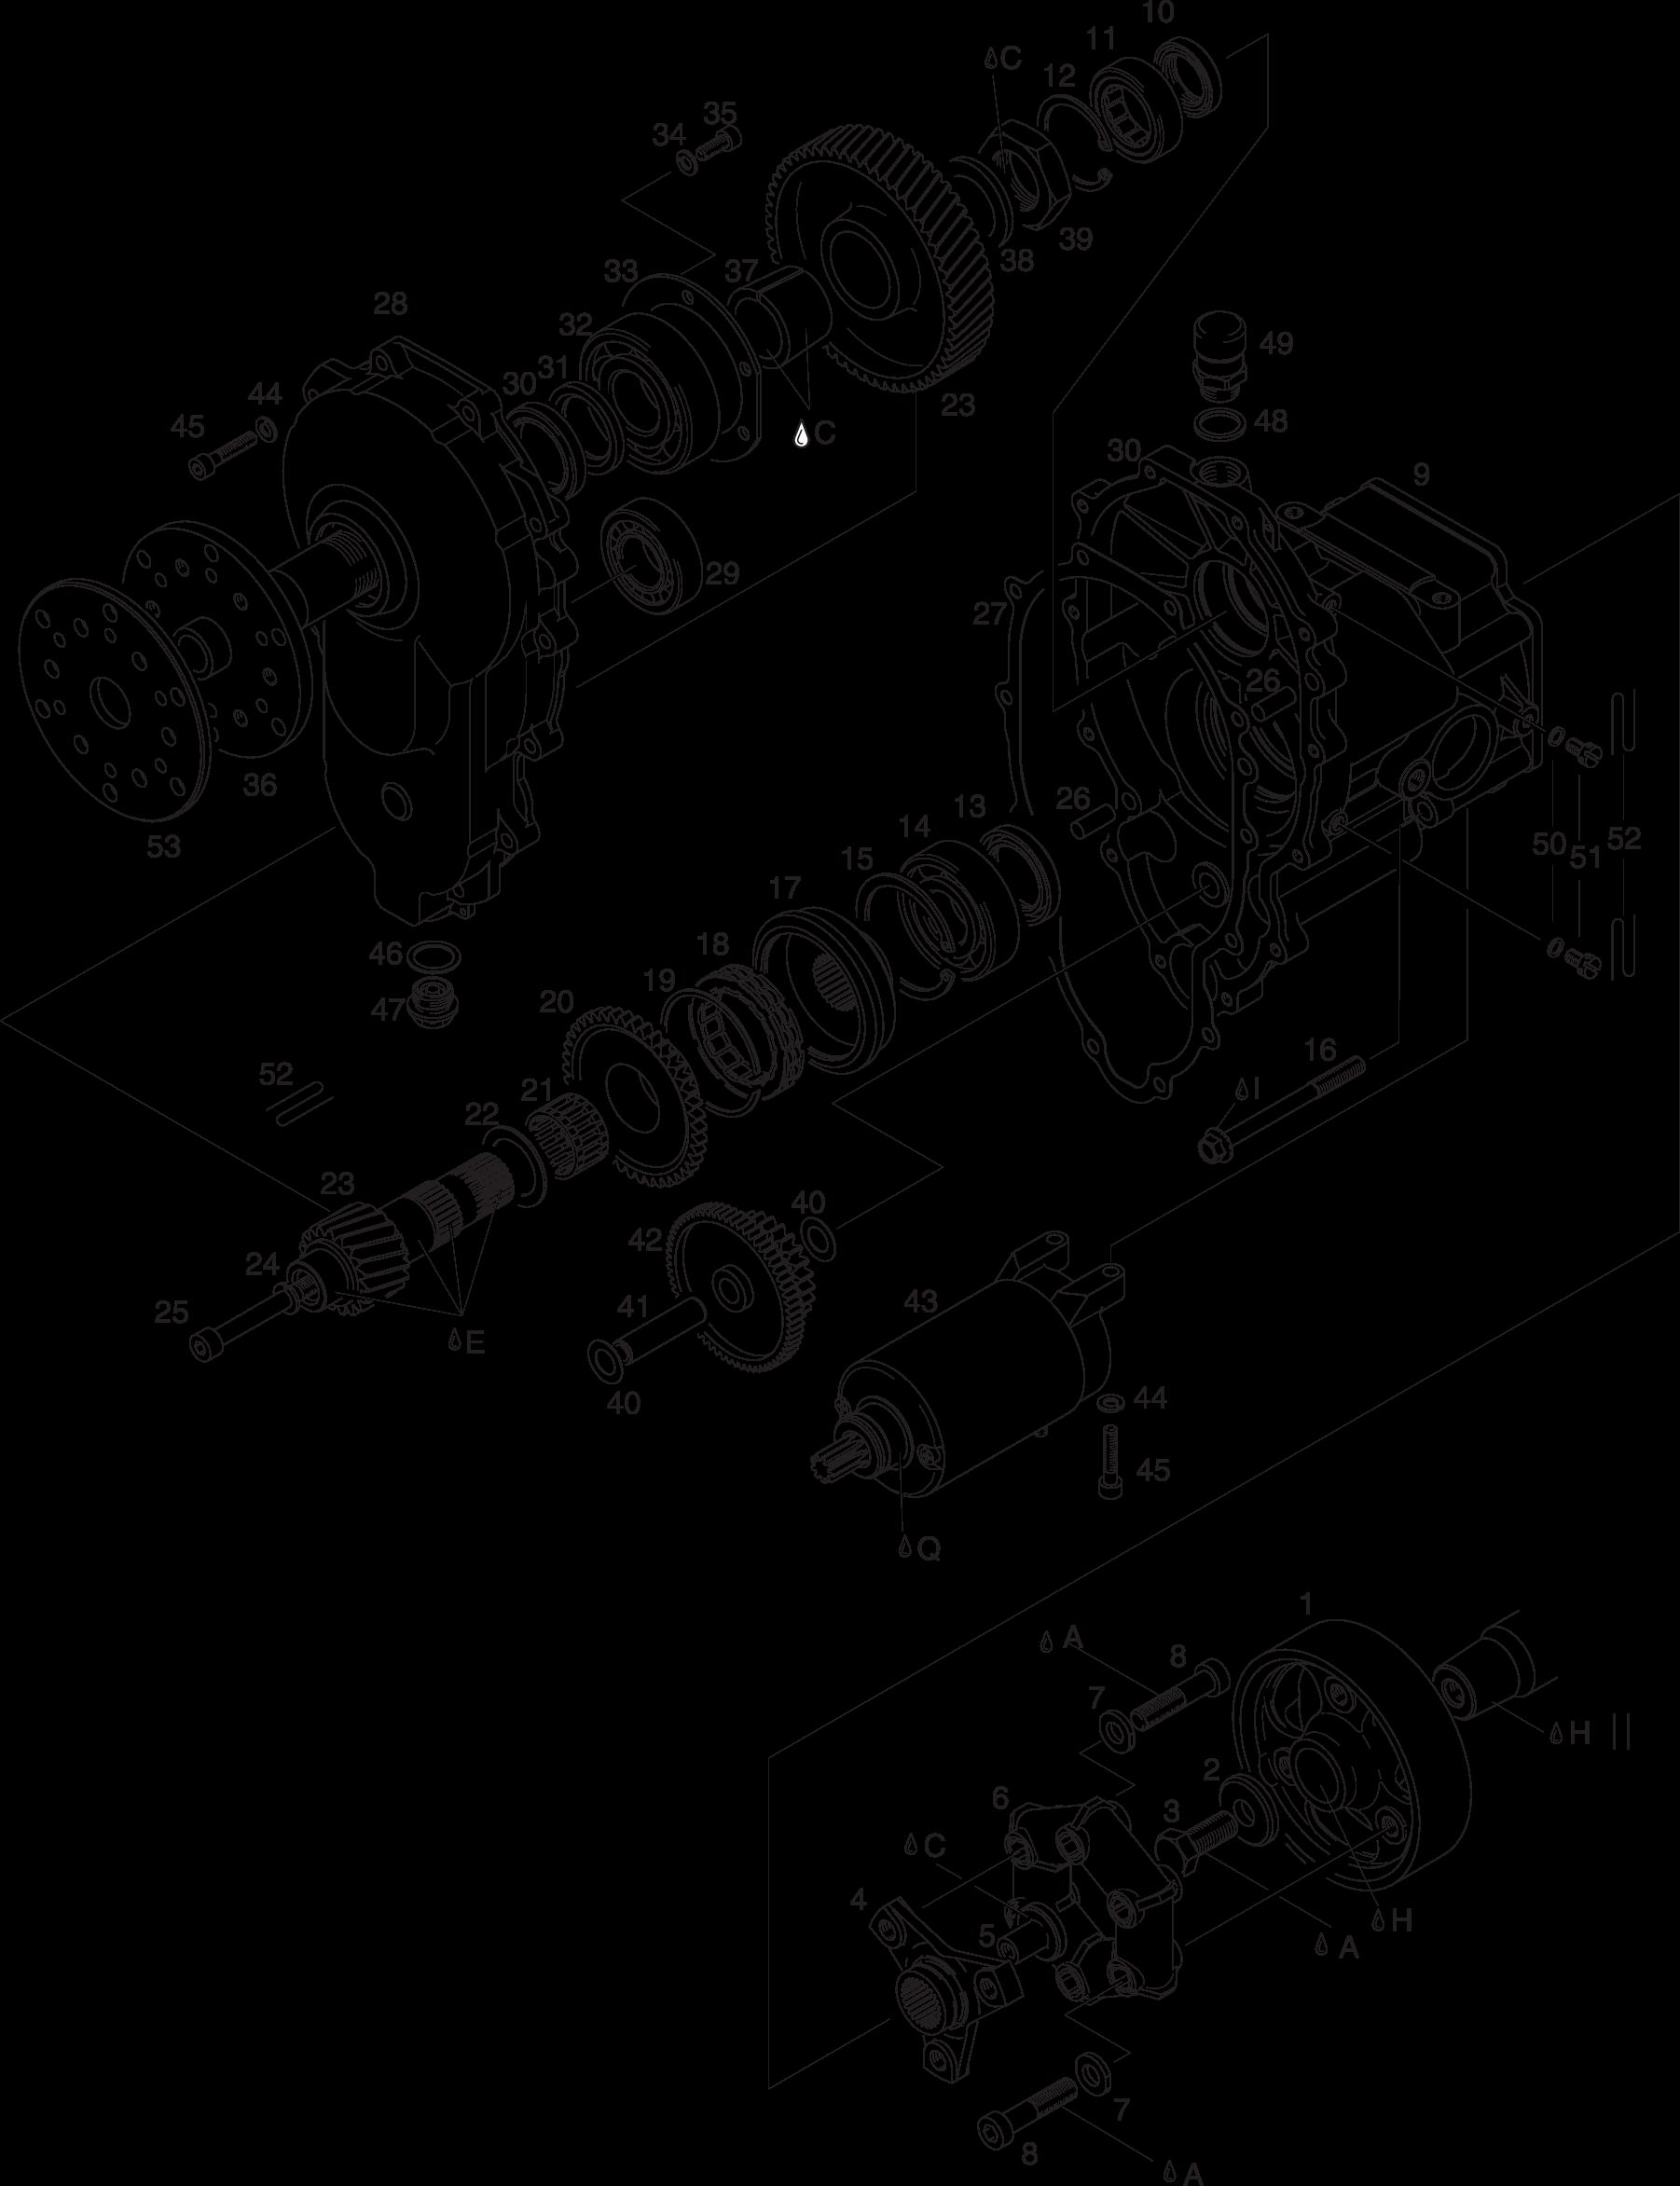 2Stroke Parts 447 503 582 Genuine ROTAX Parts ROTAX Engines – Rotax Engine Parts List Diagram